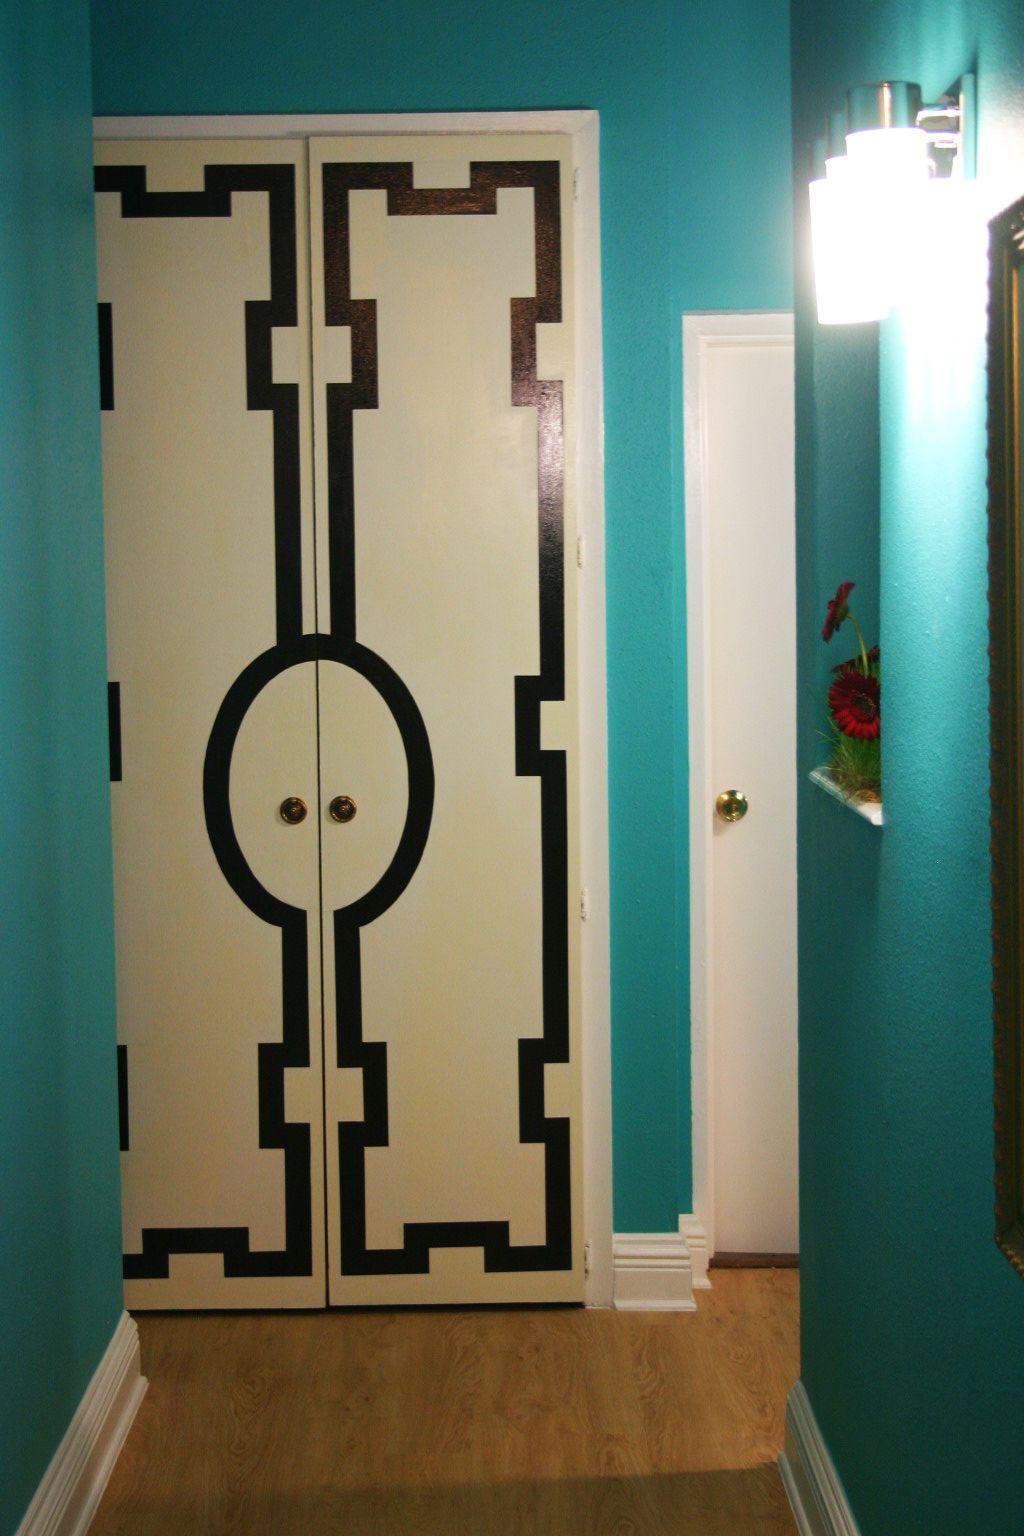 Delightful Cool Paint Treatment For Doors. Via Blog.KatieMaennle.com